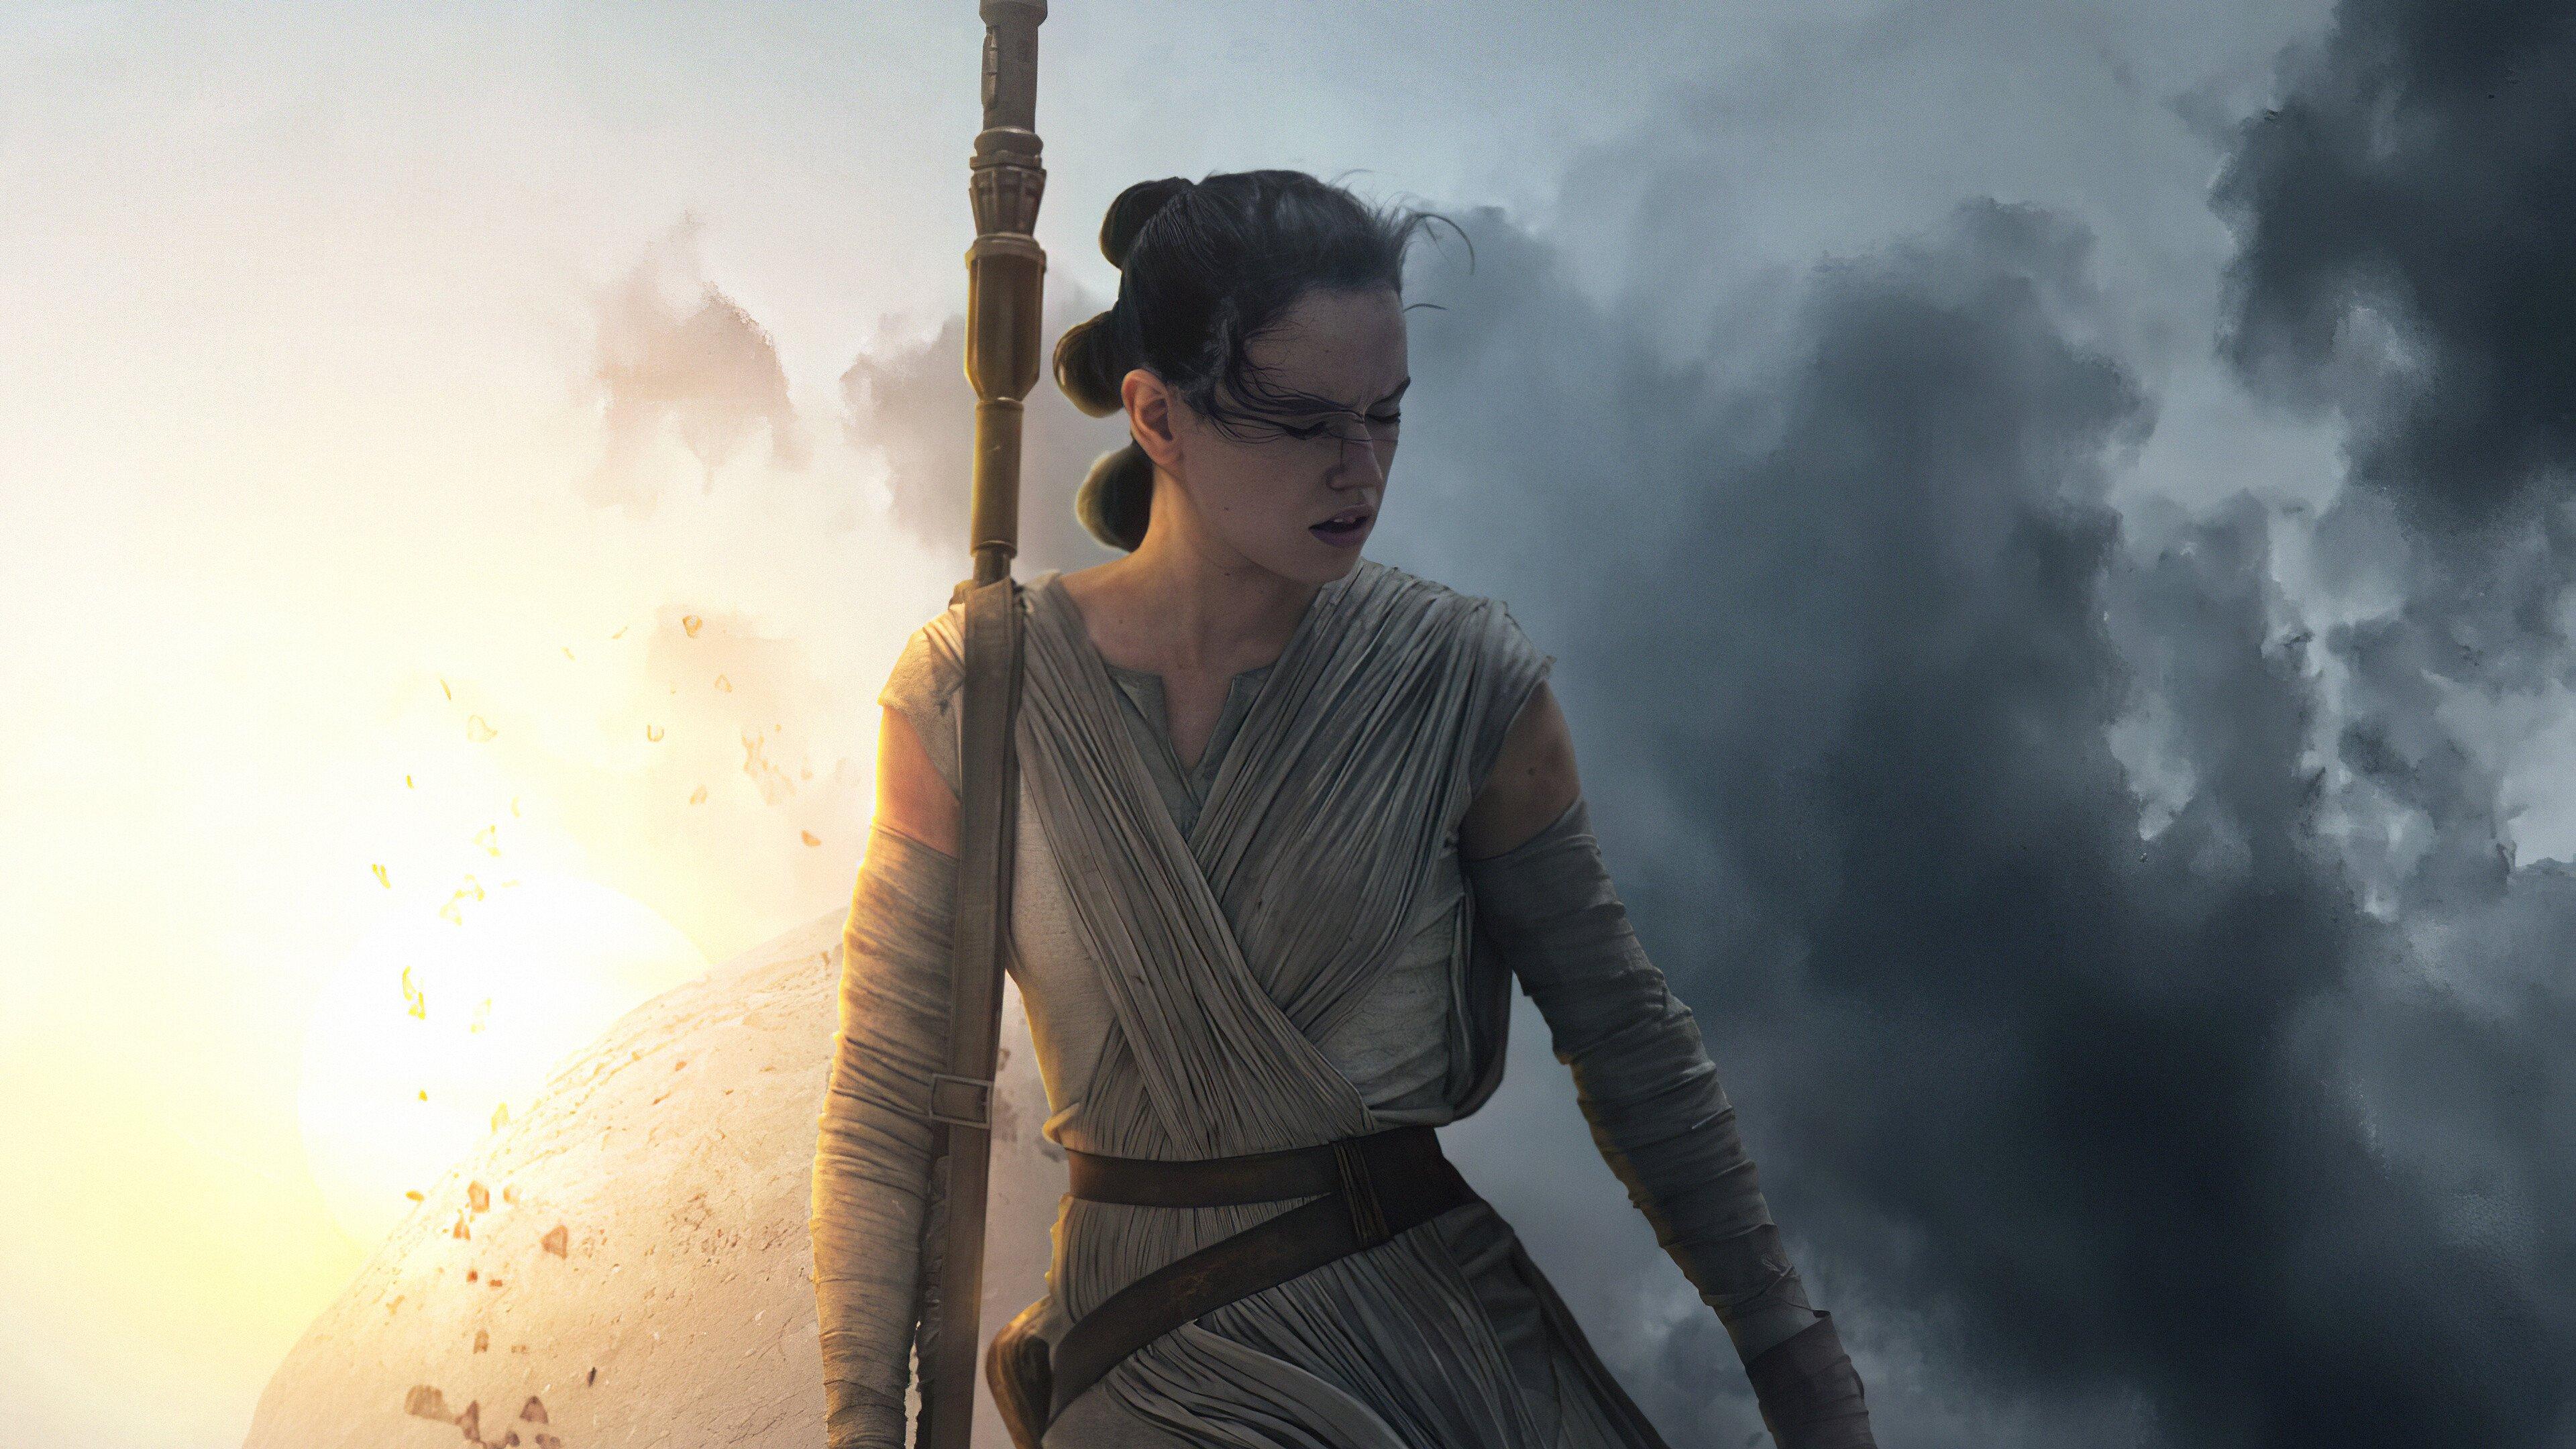 Fondos de pantalla Rey de Star Wars El ascenso del skywalker